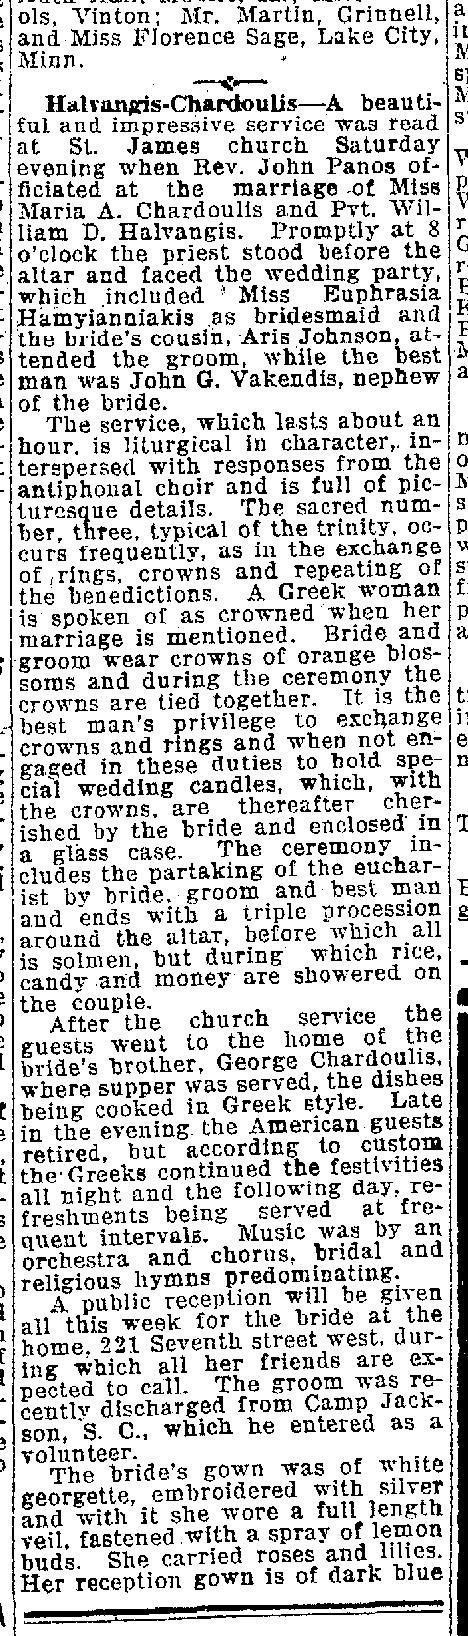 Halvangis Chardoulias wedding